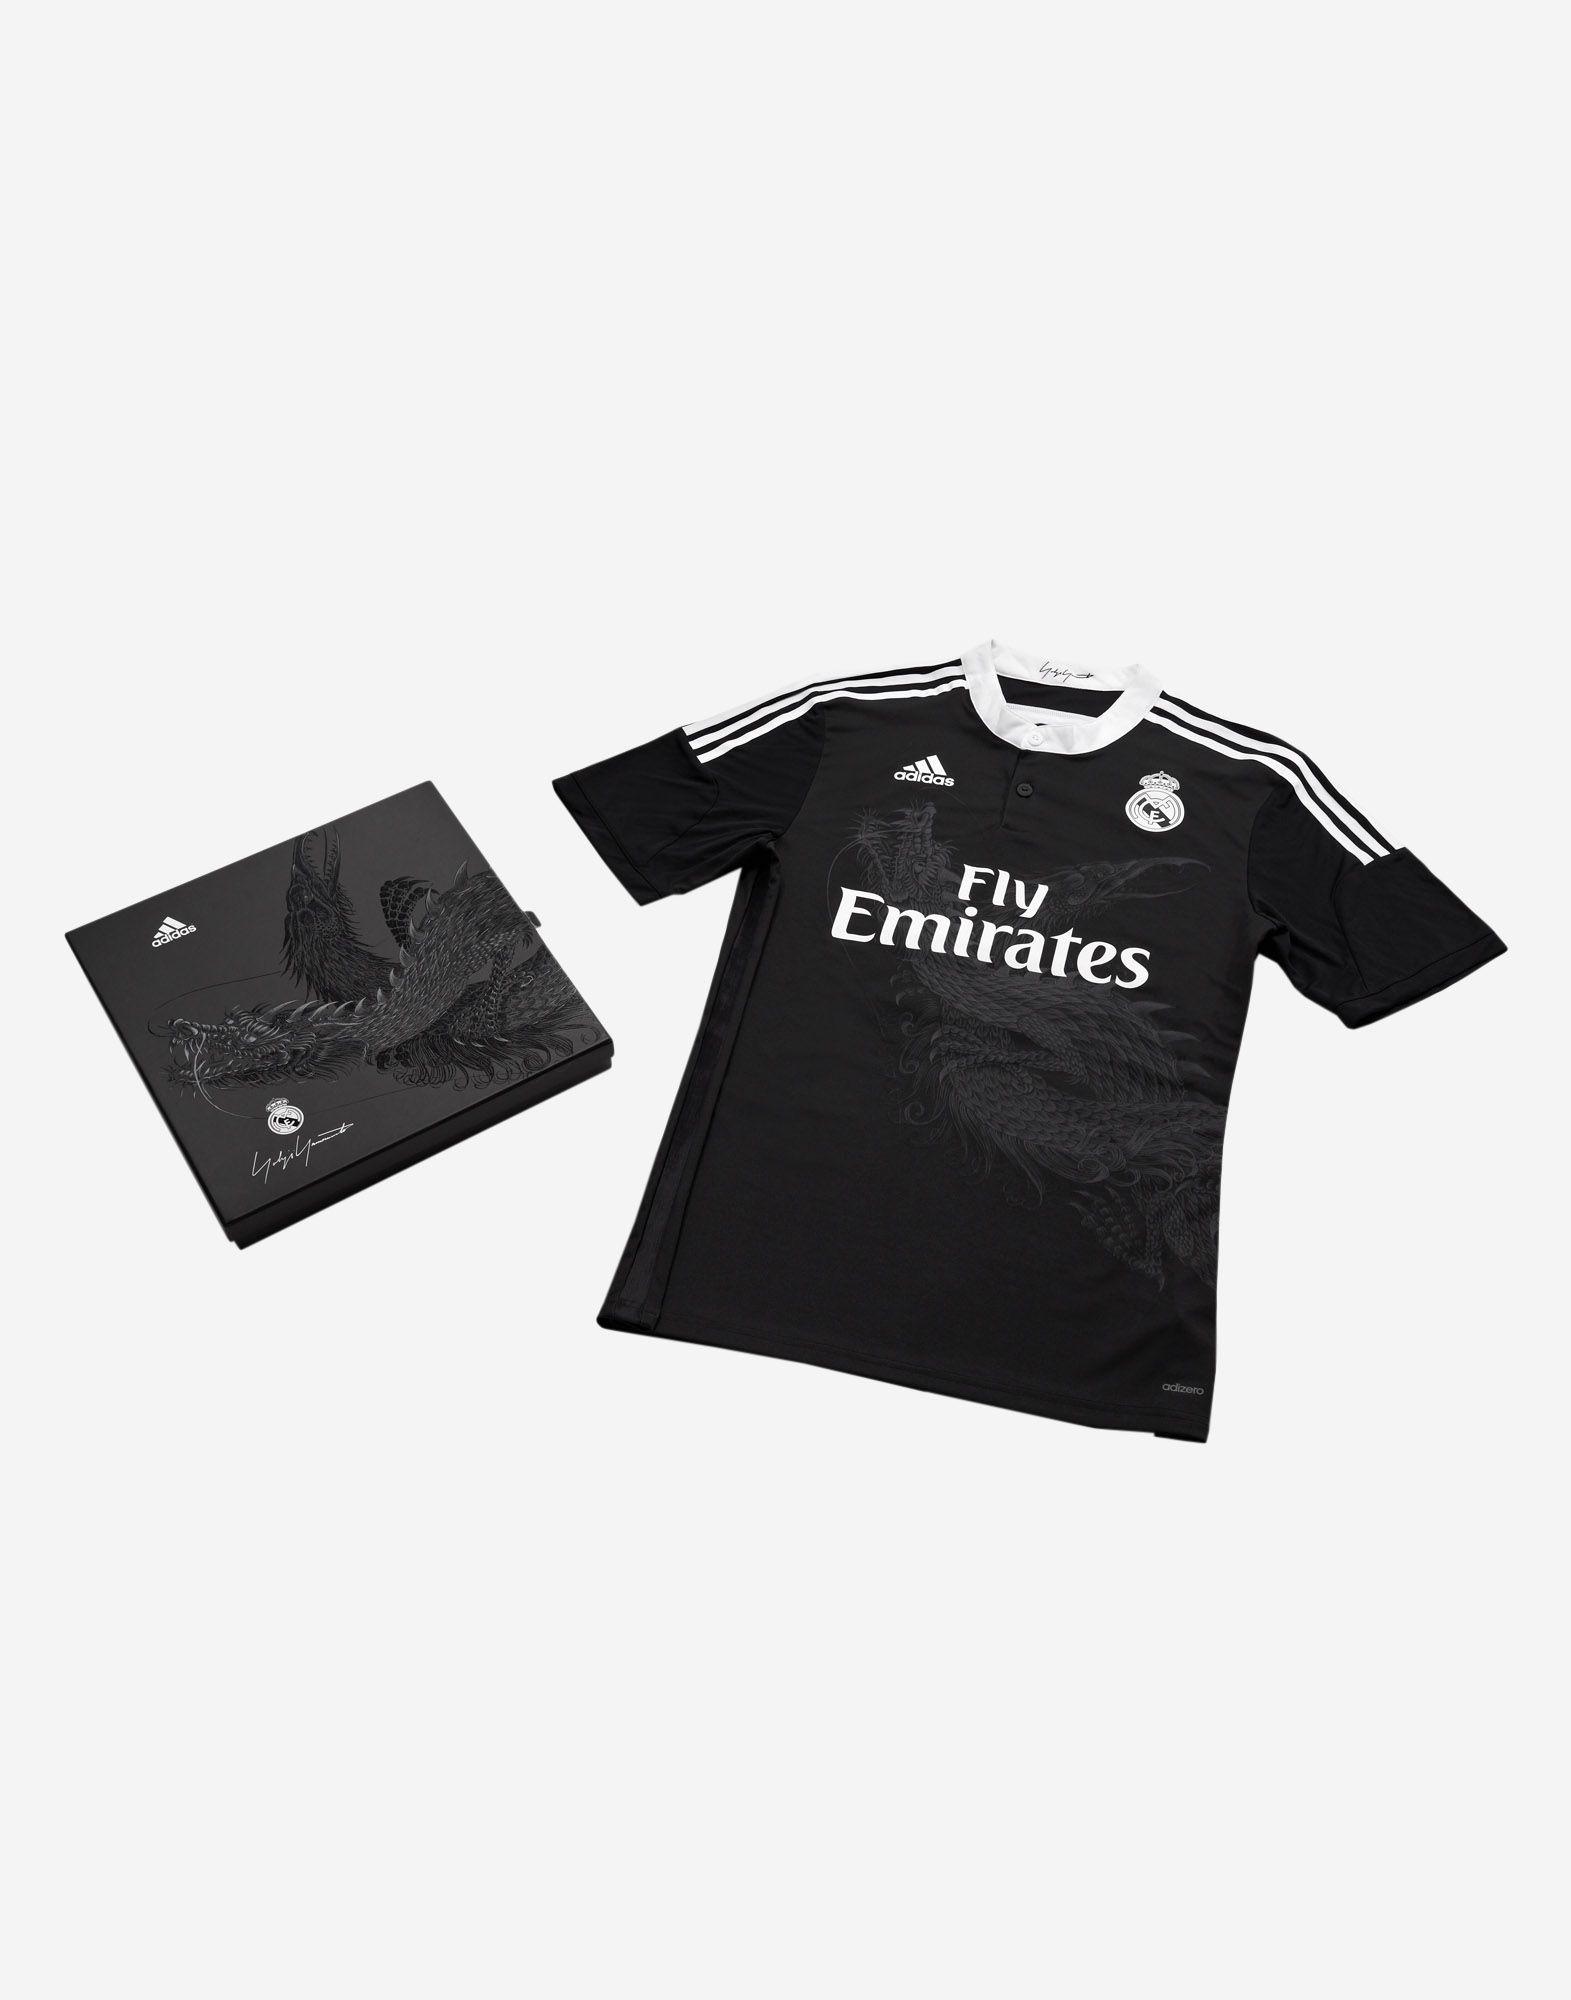 detailed look 97782 34db3 Yohji Yamamoto For RM Short Sleeve t Shirts | Adidas Y-3 ...